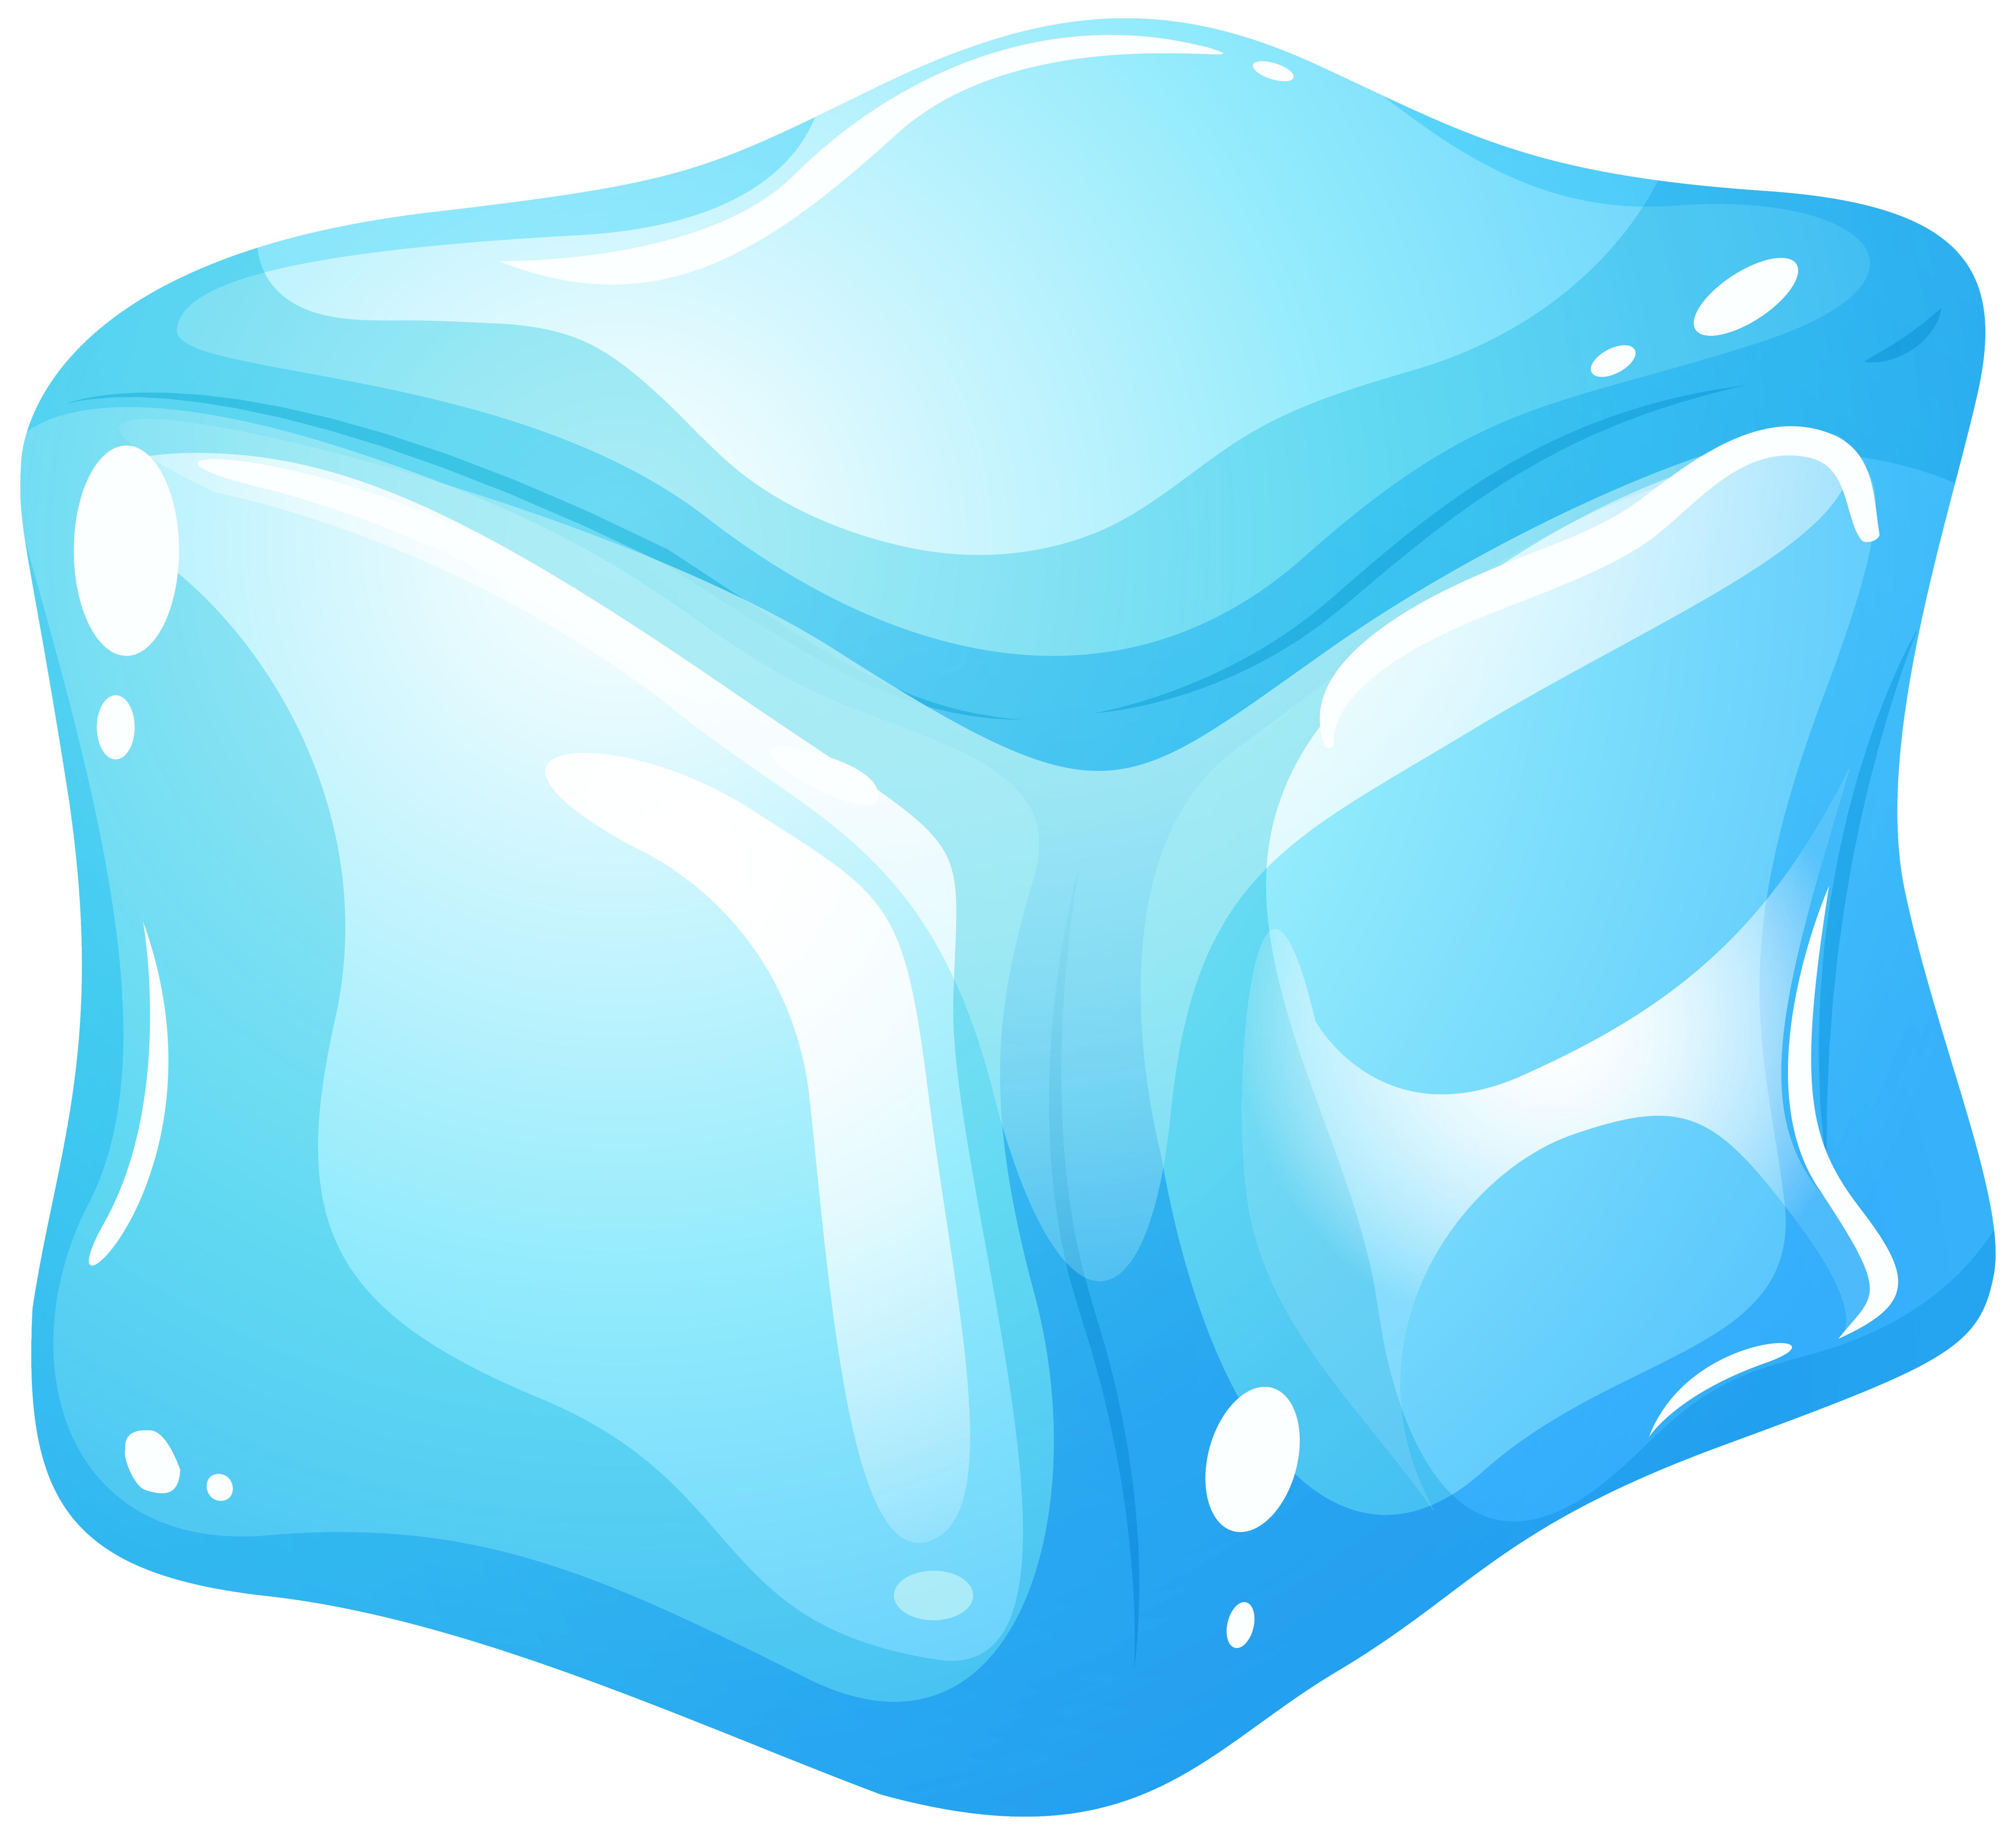 Ice Cube Blue Clip Art Web Clipart 2-Ice cube blue clip art web clipart 2-6